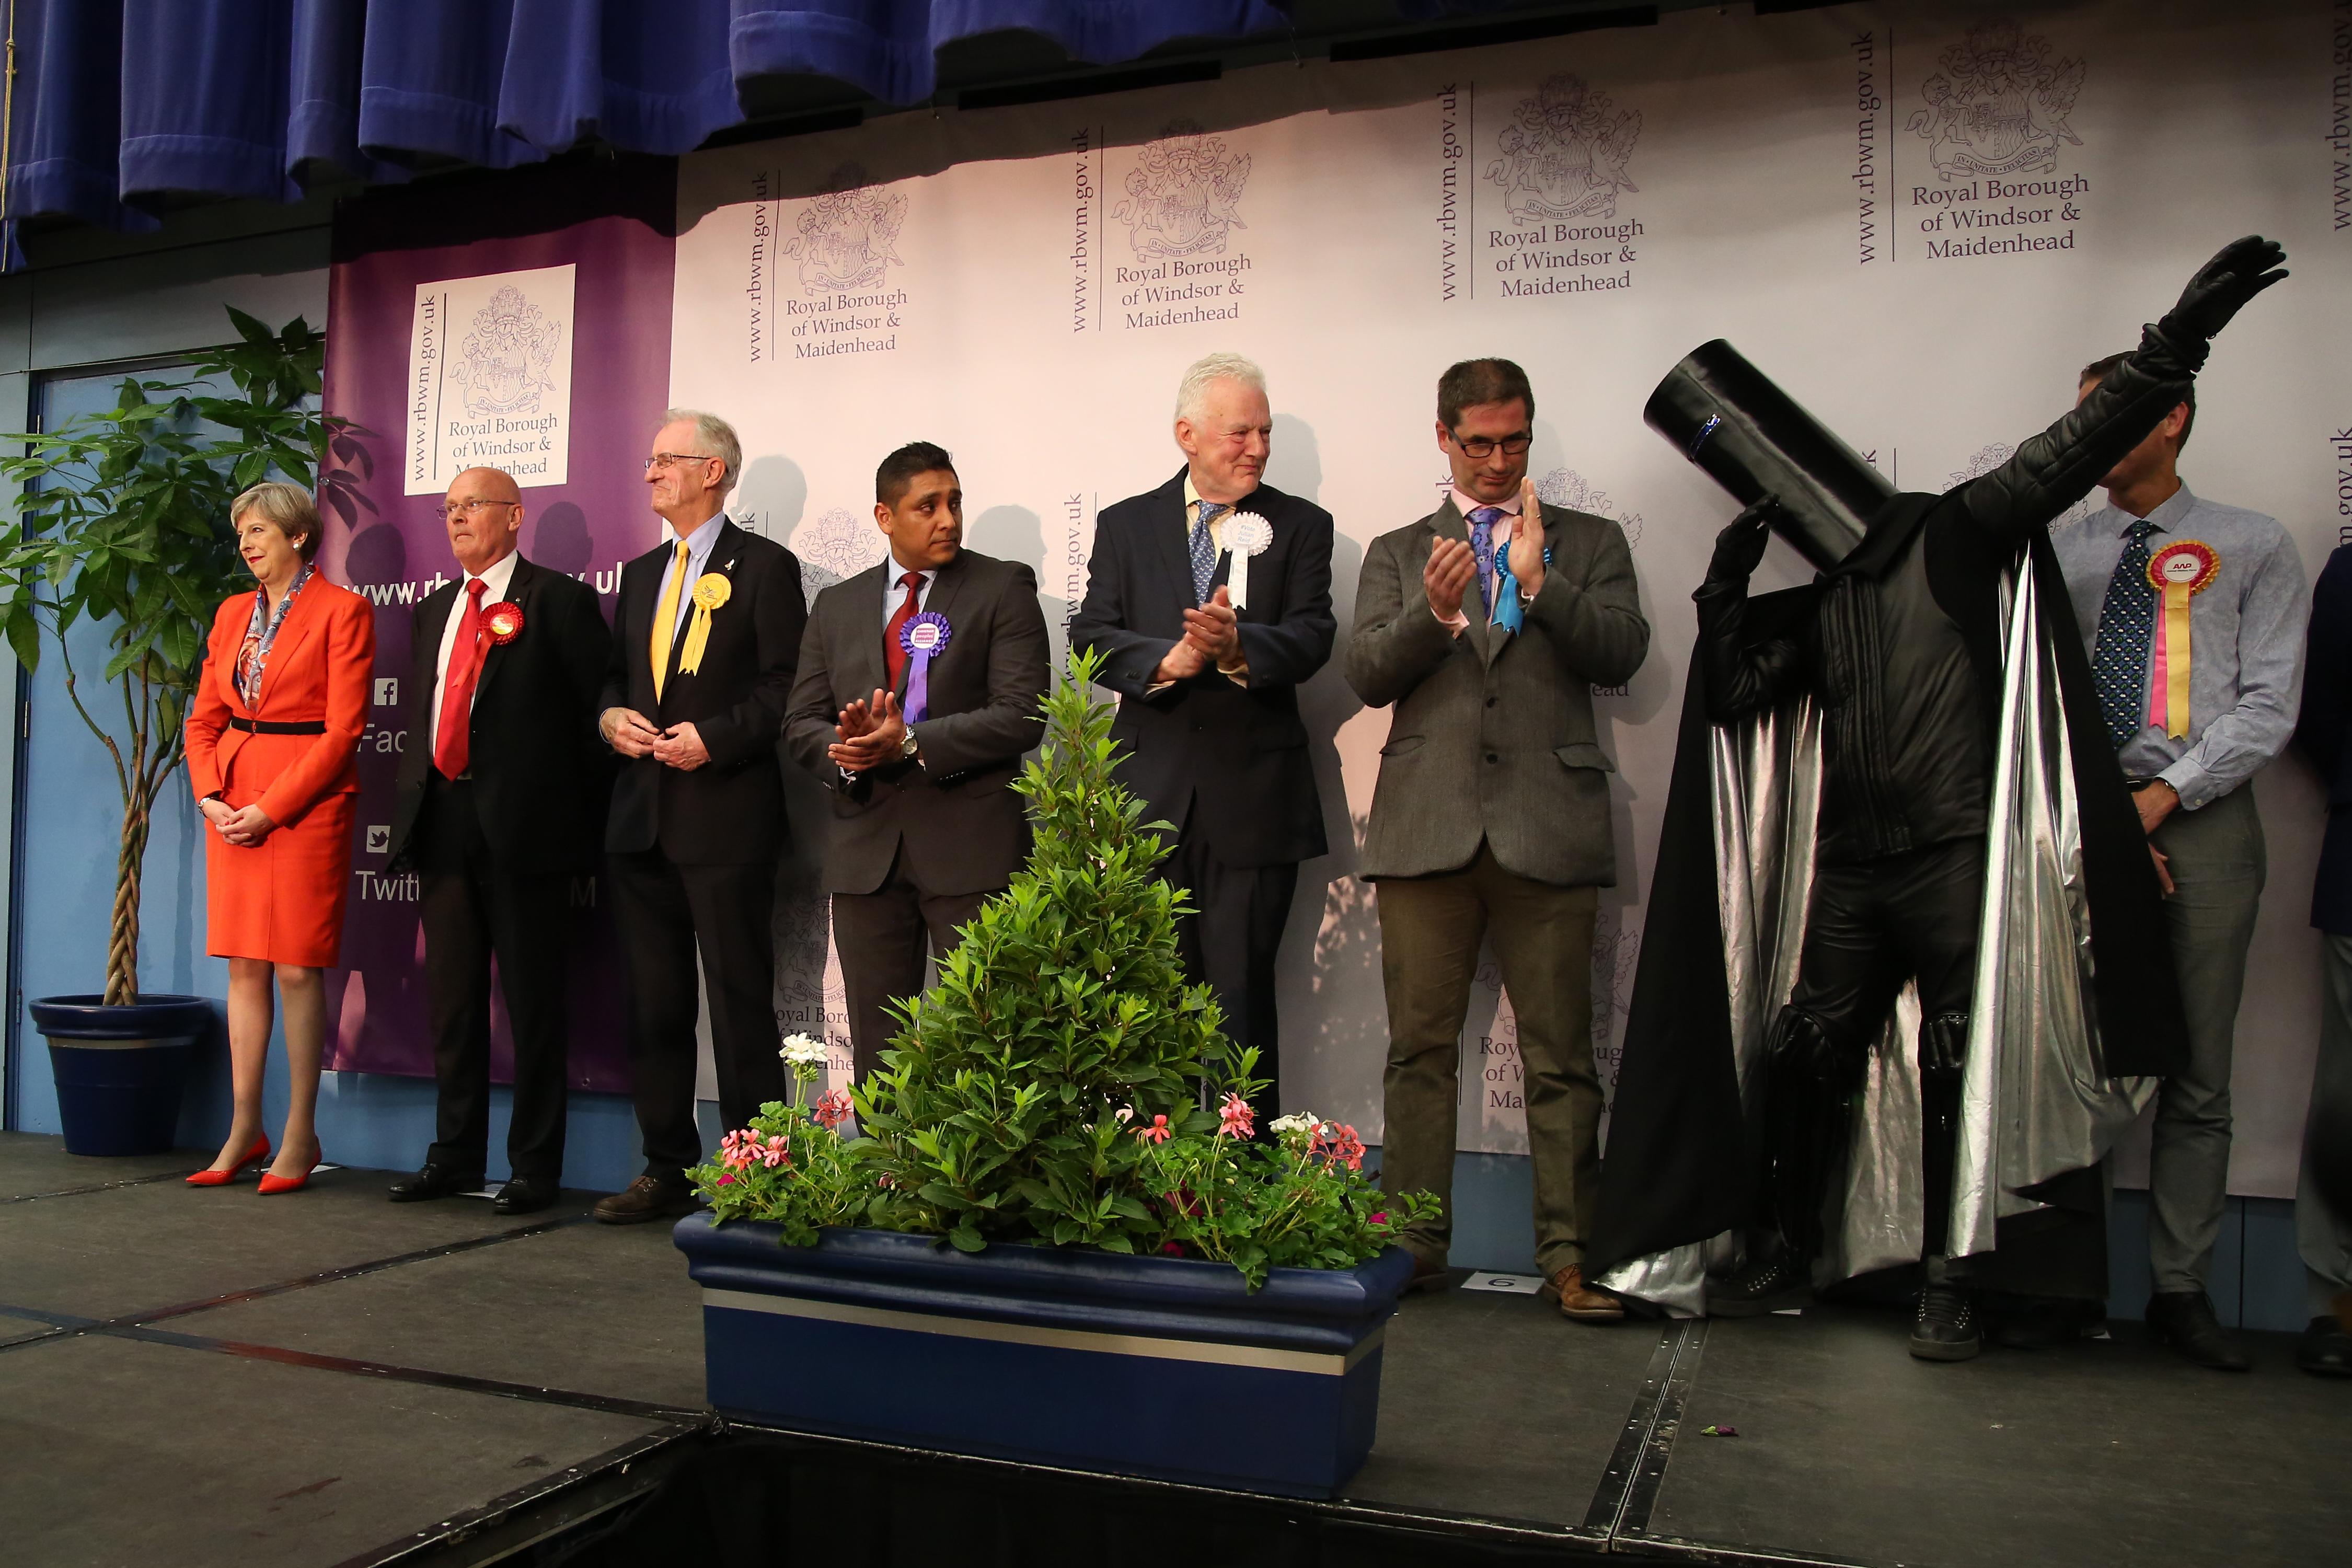 Lord Buckethead 249 szavazatot kapott